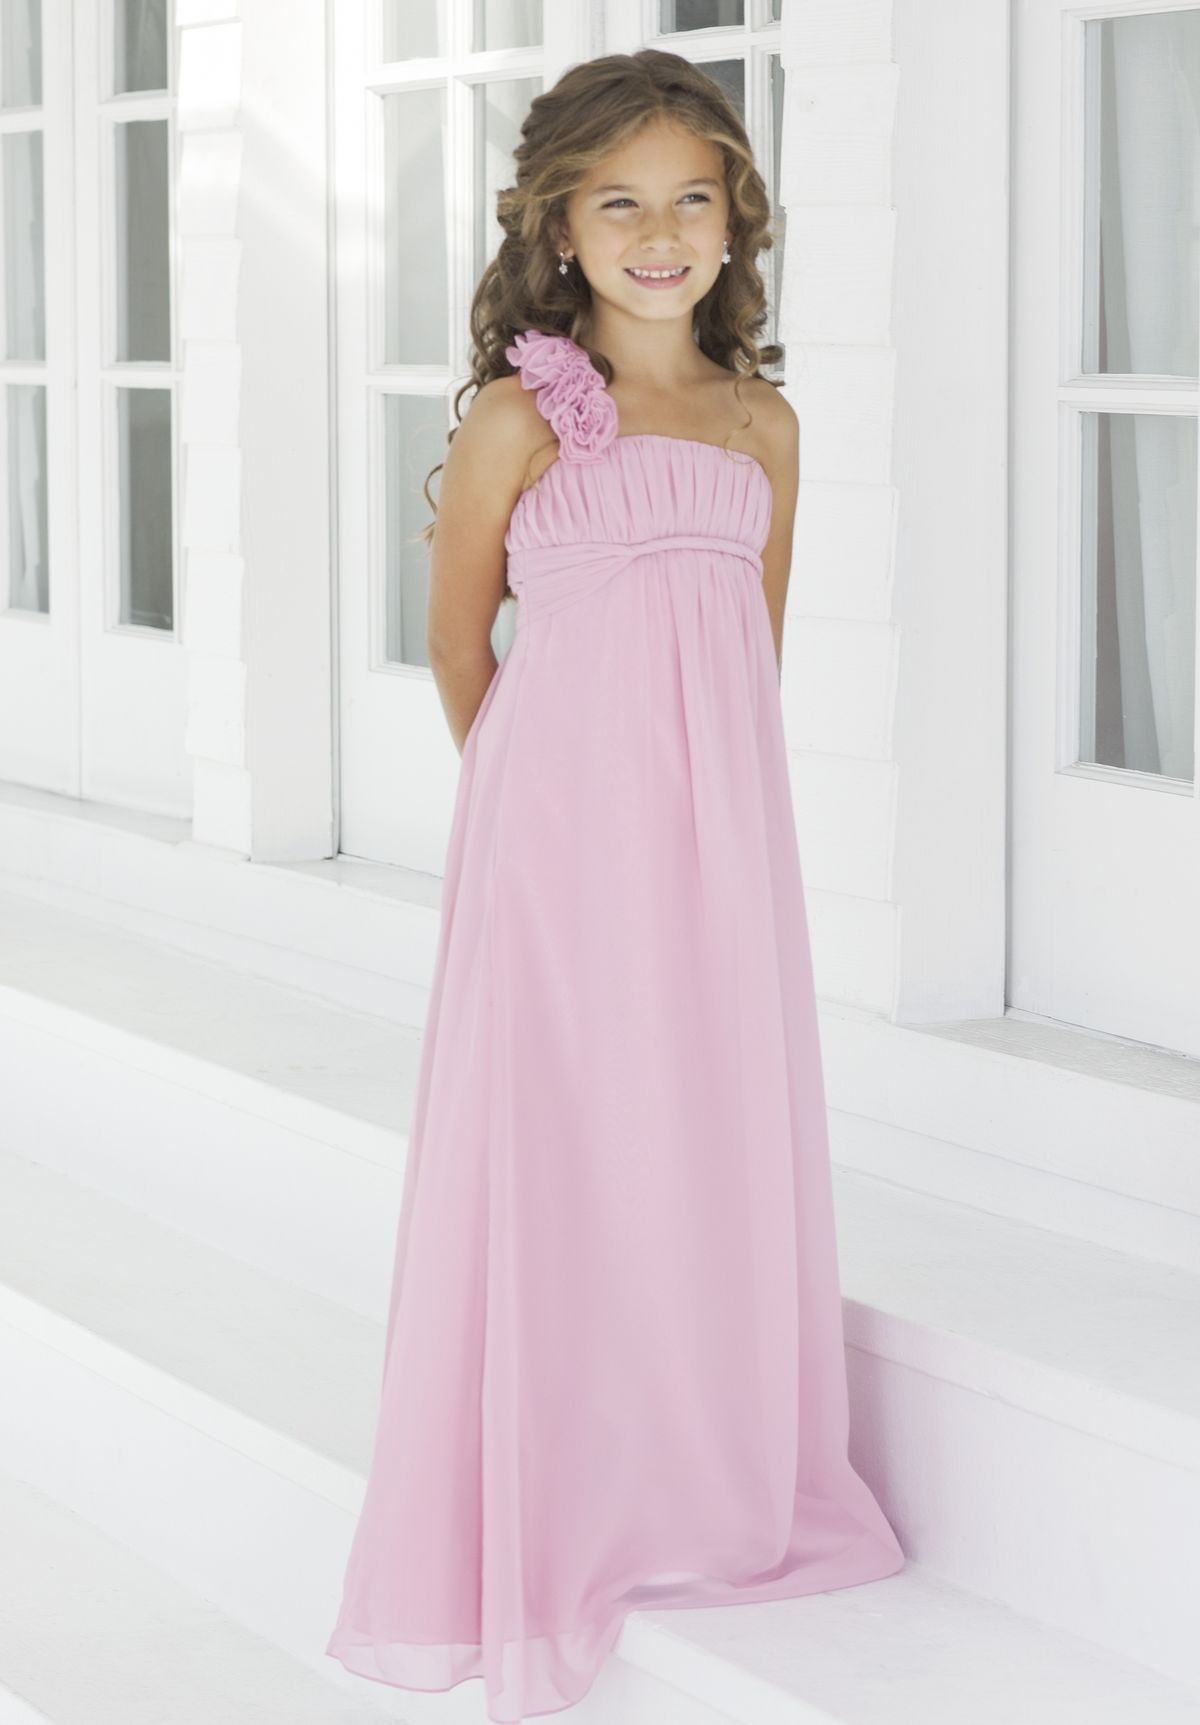 10  images about Junior Bridesmaid Dresses on Pinterest  Junior ...